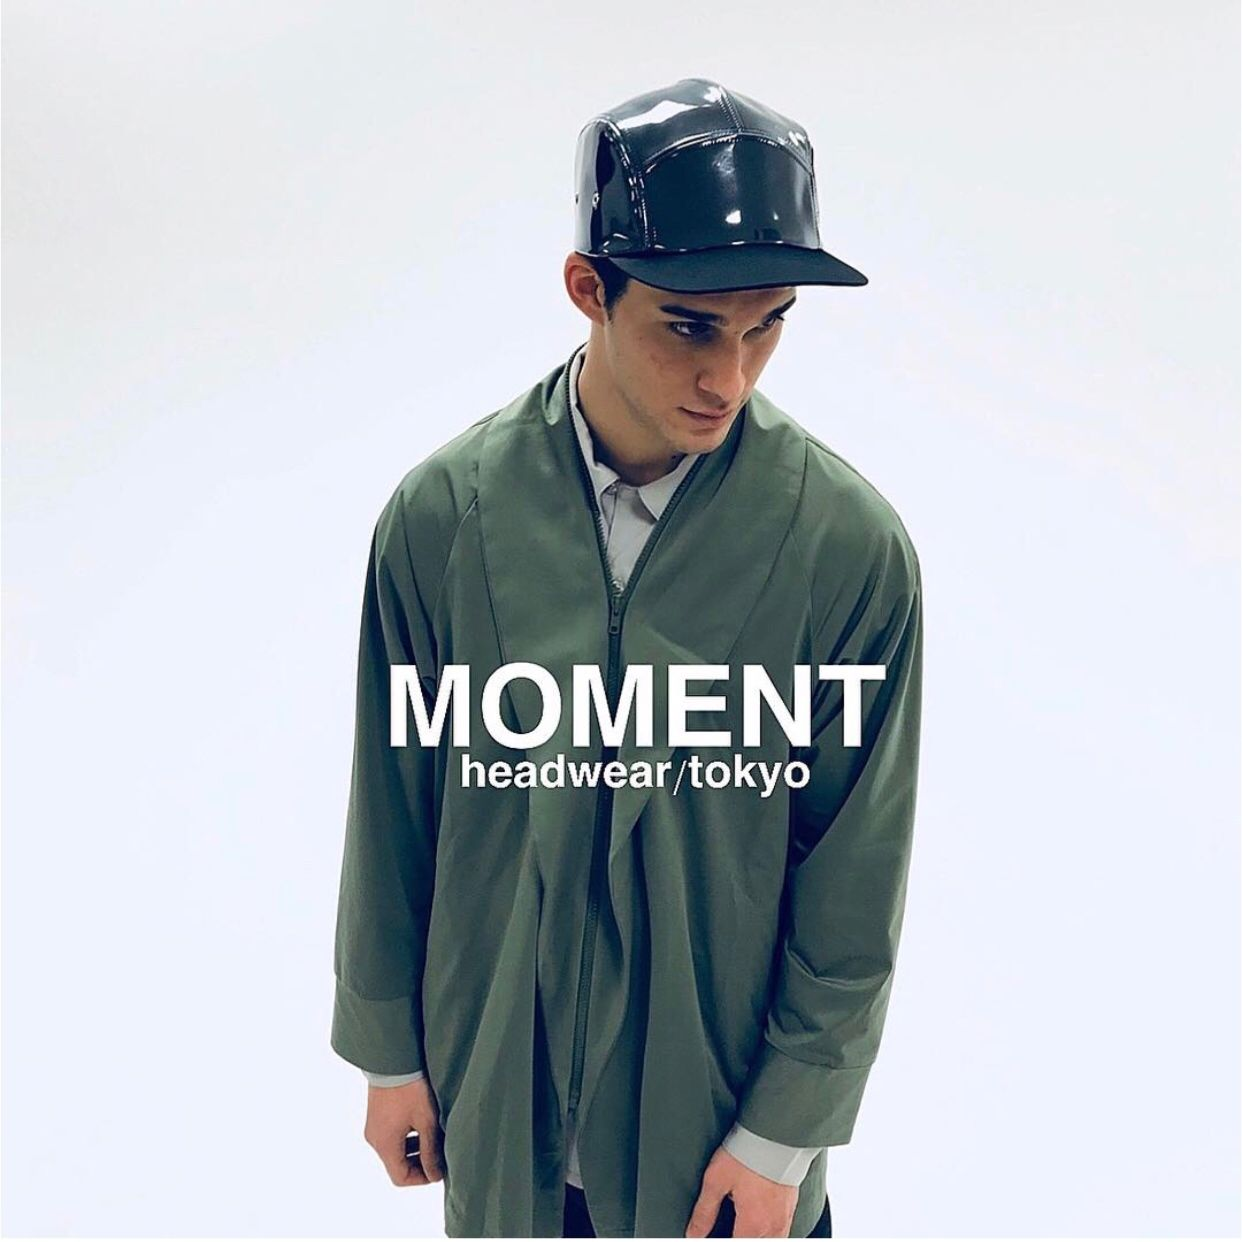 MOMENT headwear/tokyo キャップ専門店